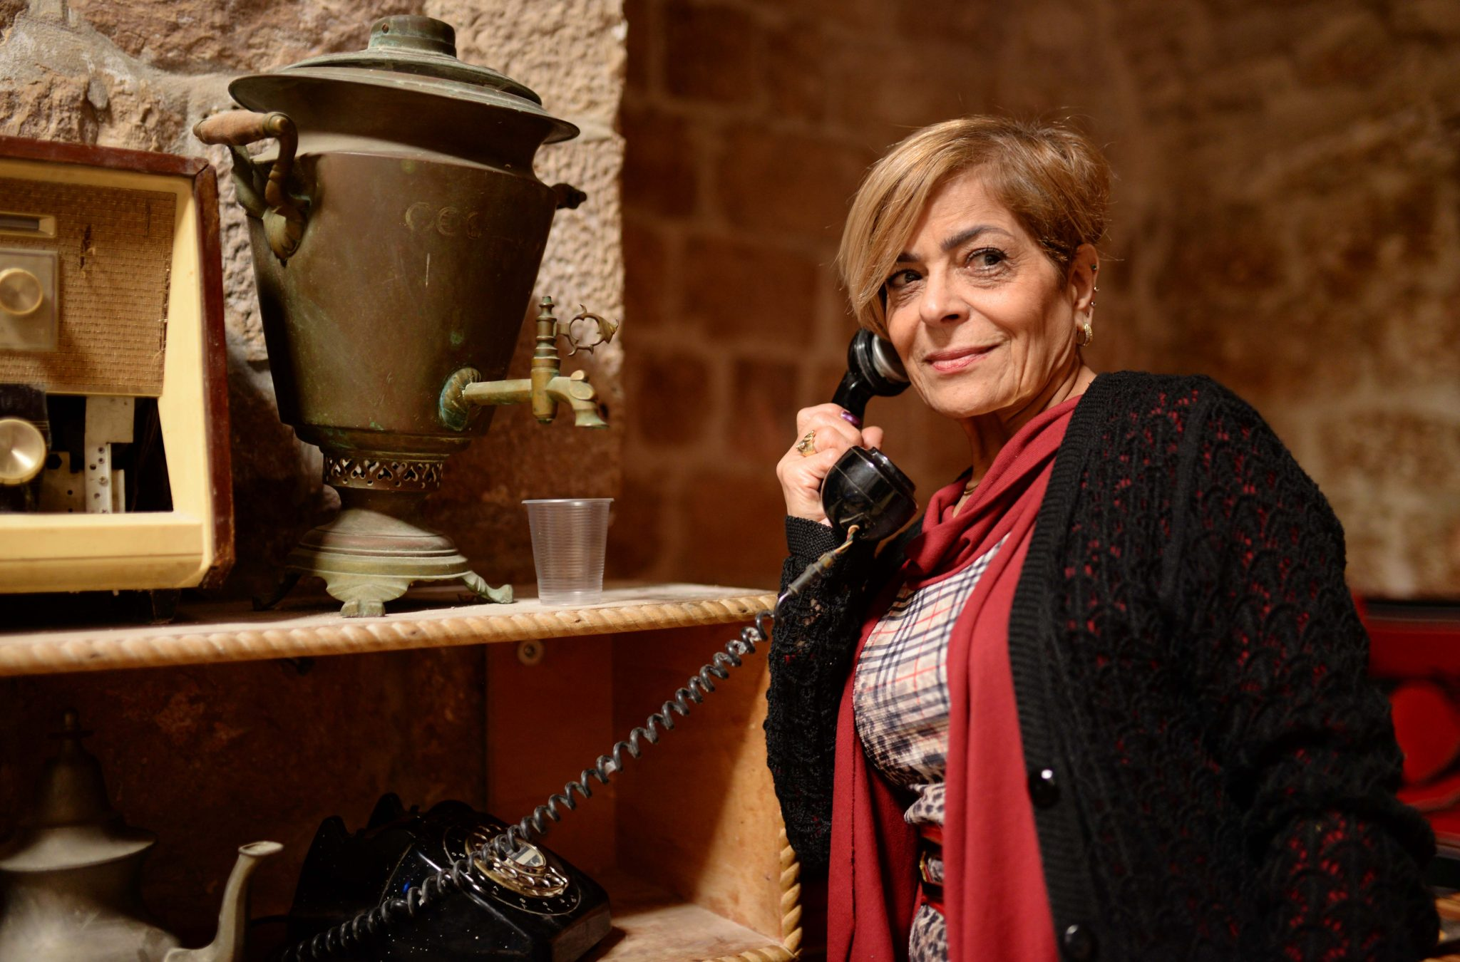 My relative at a Turkish Bath in Nablus